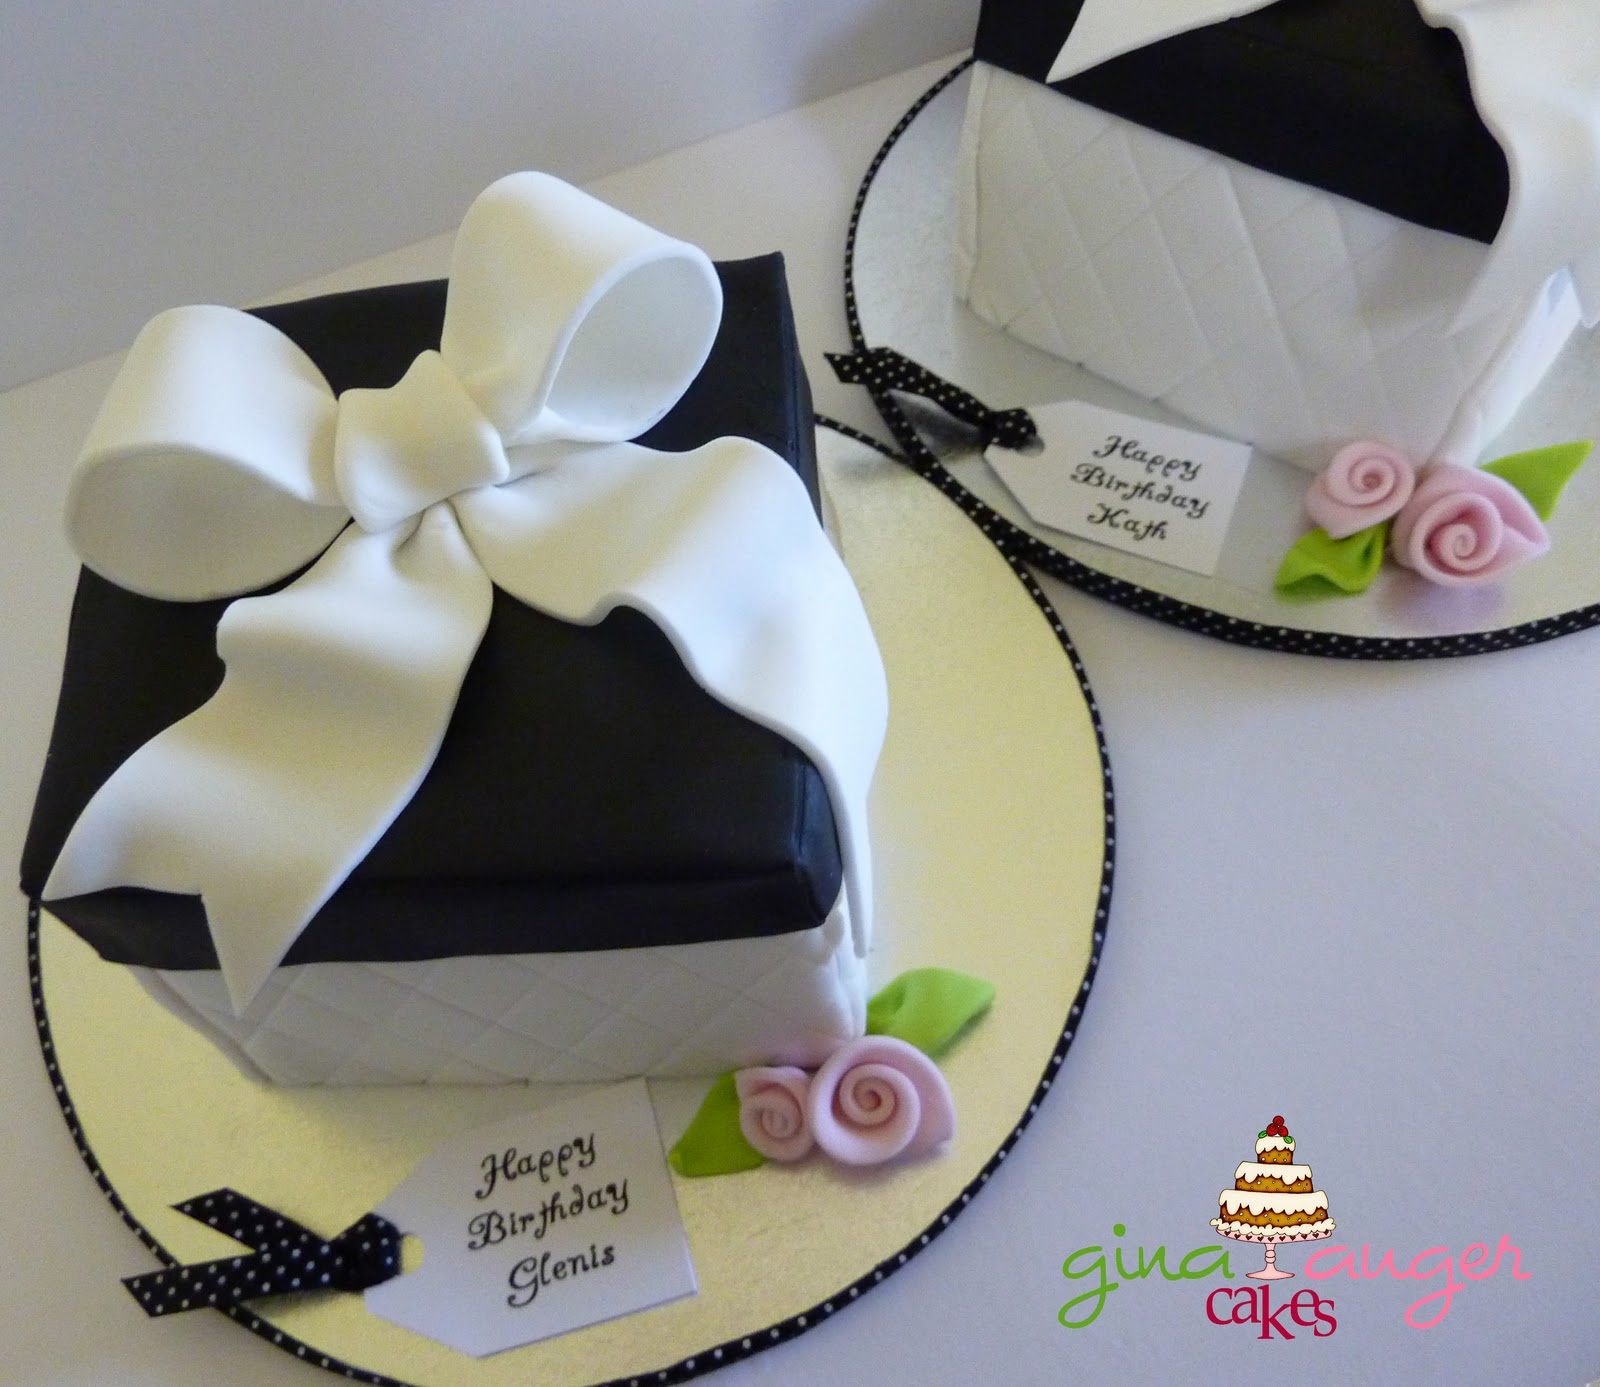 Top that mini black white gift box cakes mini black white gift box cakes negle Images